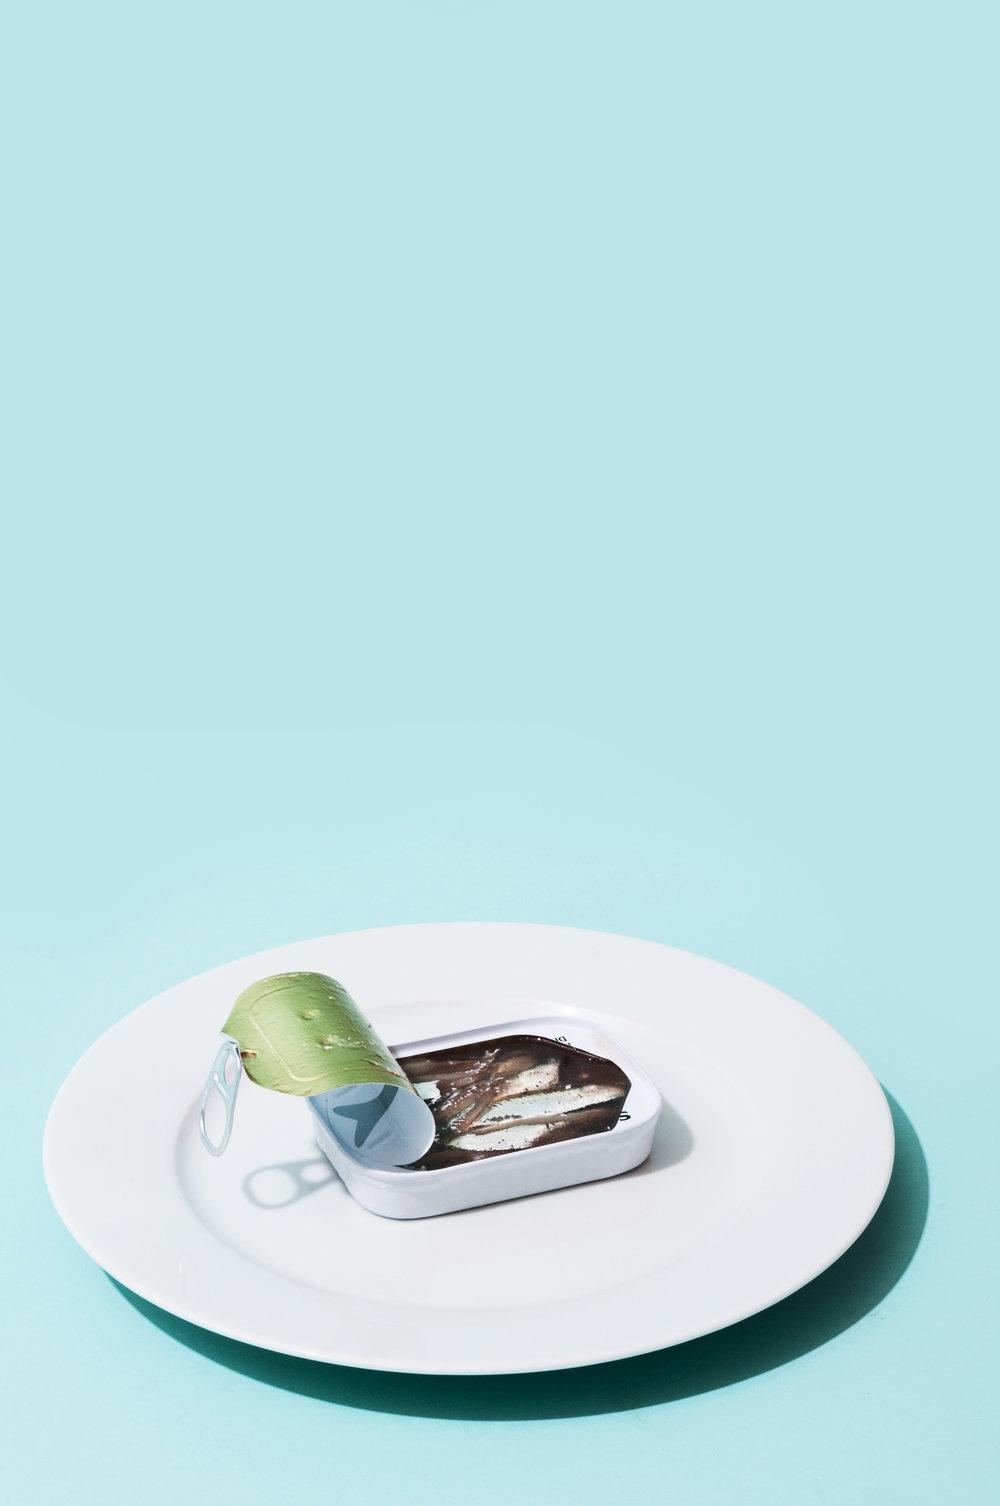 sardines copy.jpg